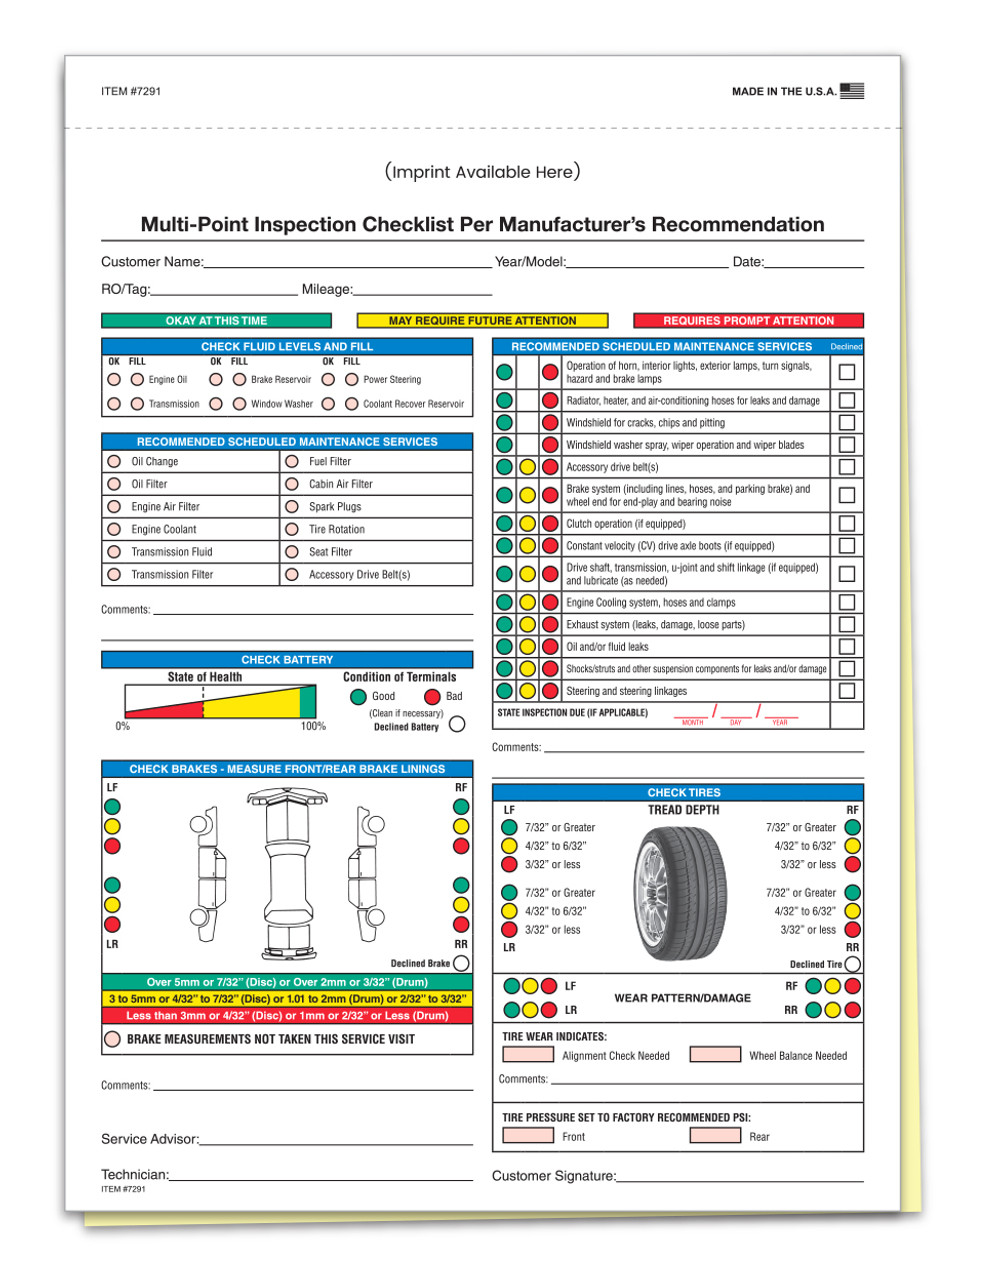 Custom Imprint Multi-Point Inspection 2 Part Form (Form-#7291)